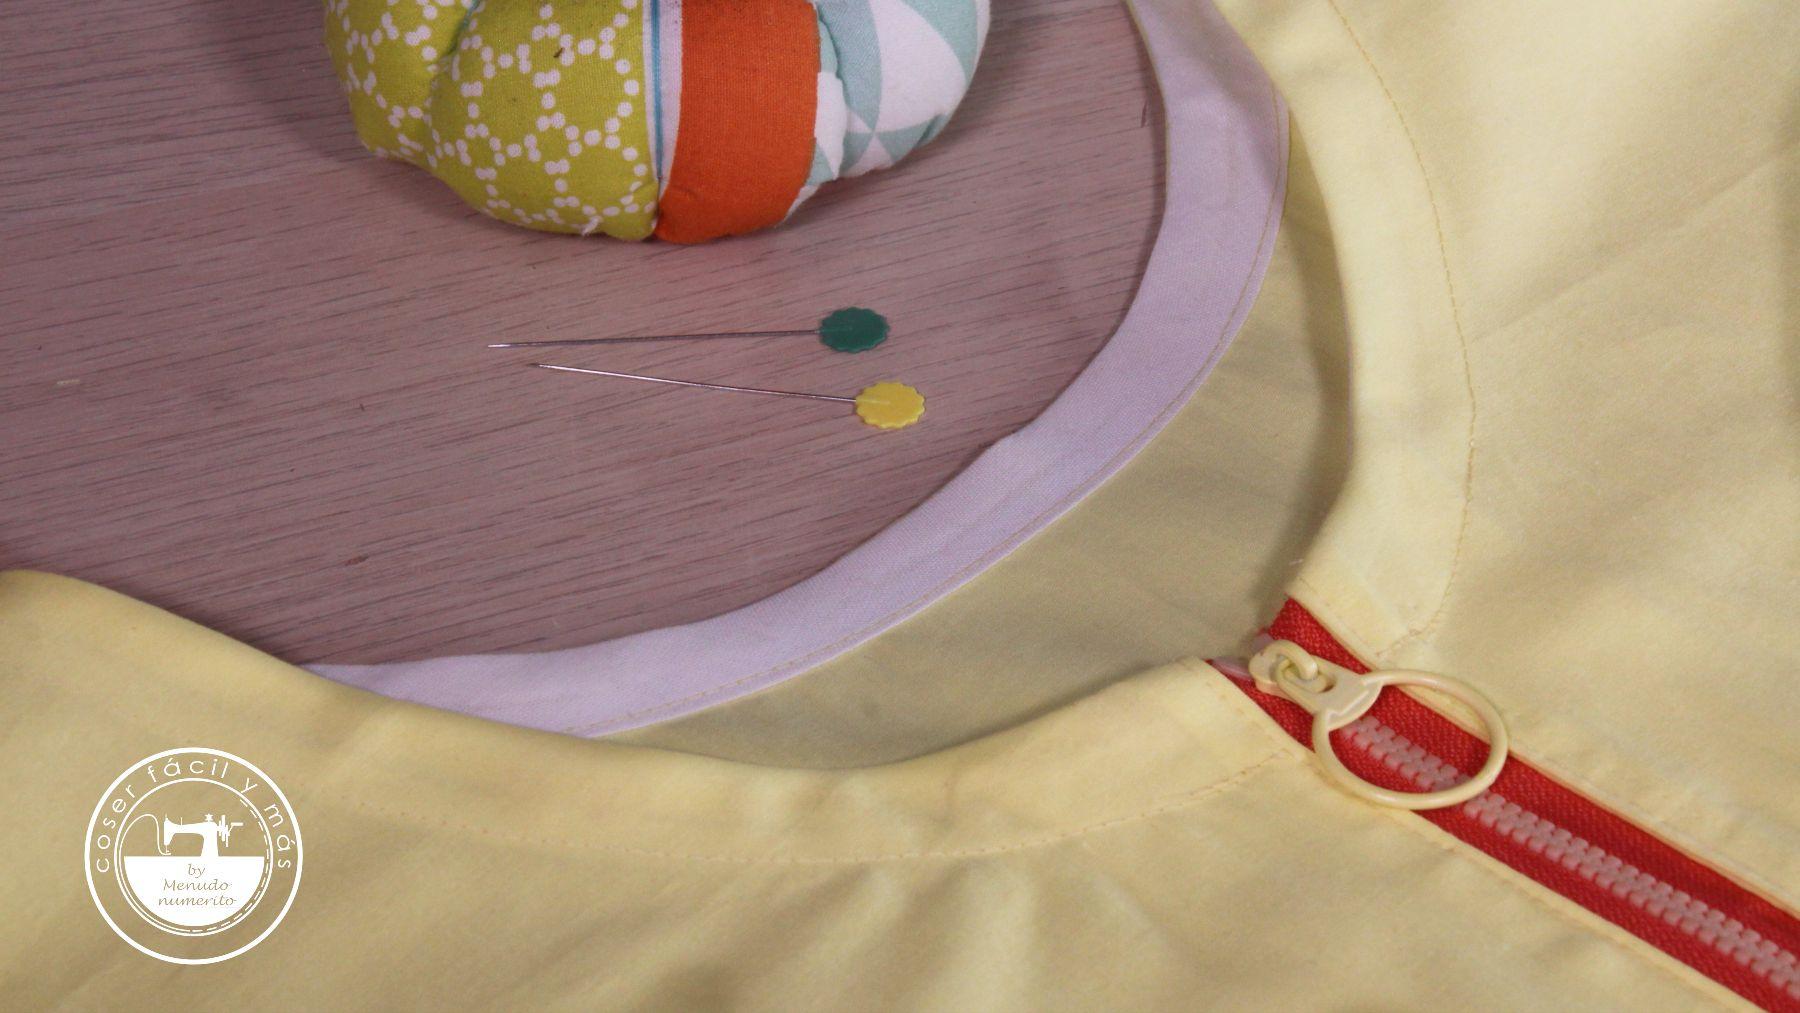 rematar bies sesgo escotes coser facil blogs de costura menudo numerito